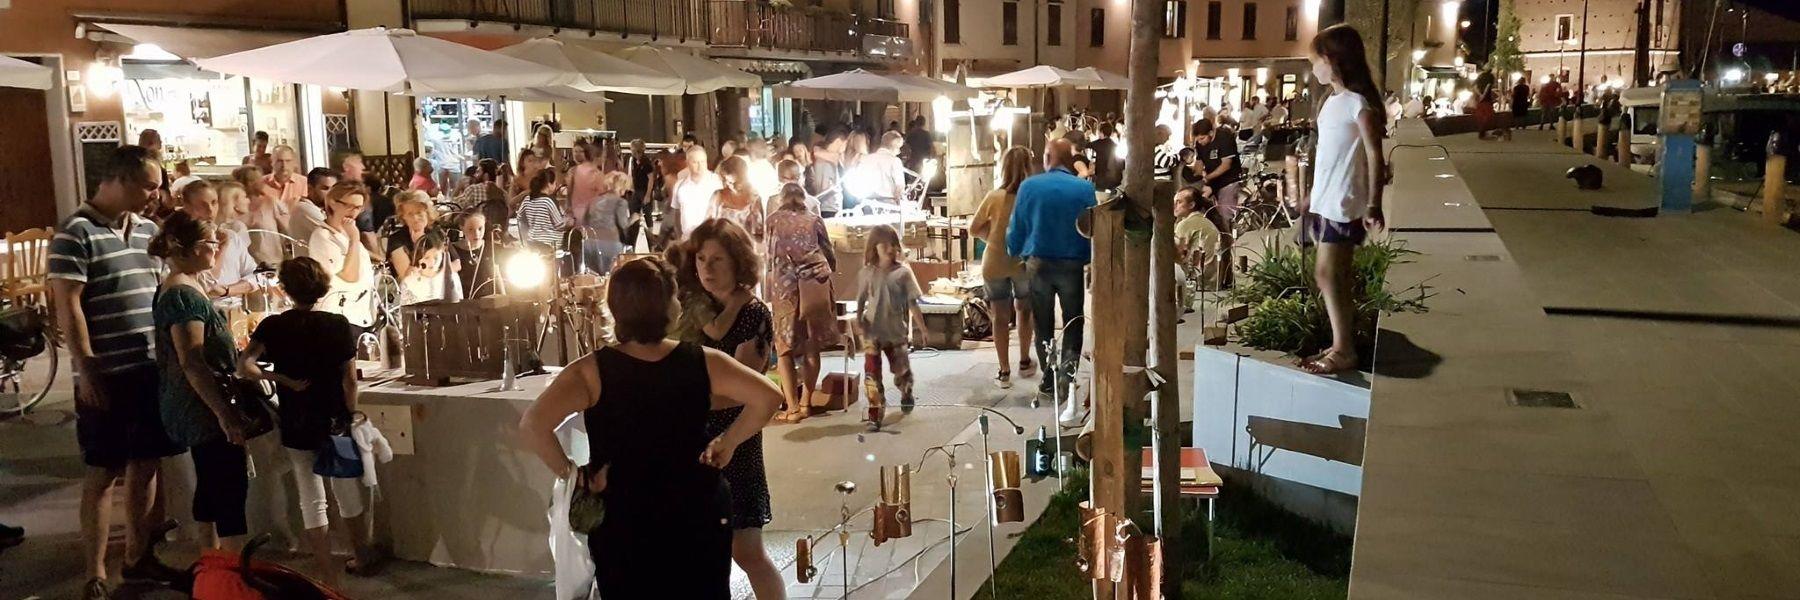 Borgomarina Marktfestival